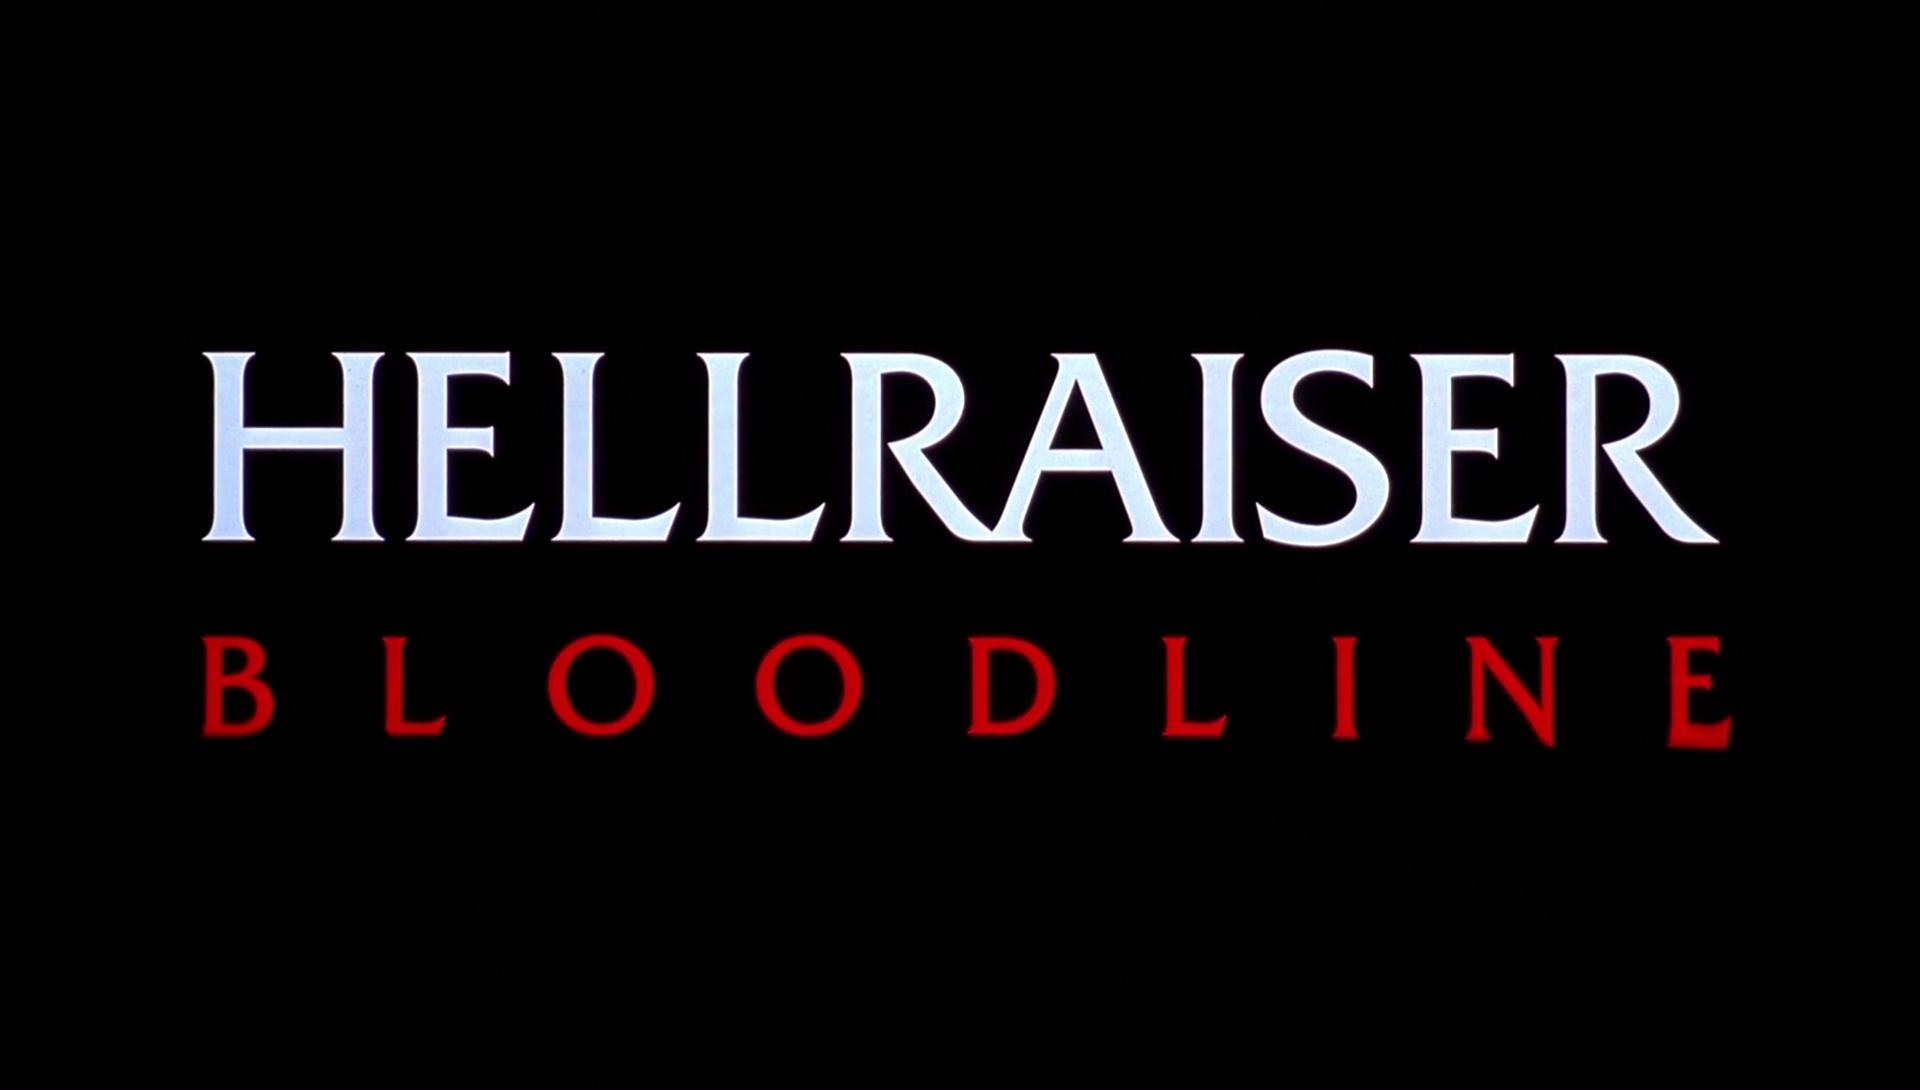 HELLRAISER BLOODLINE de Alan Smithee (1996)